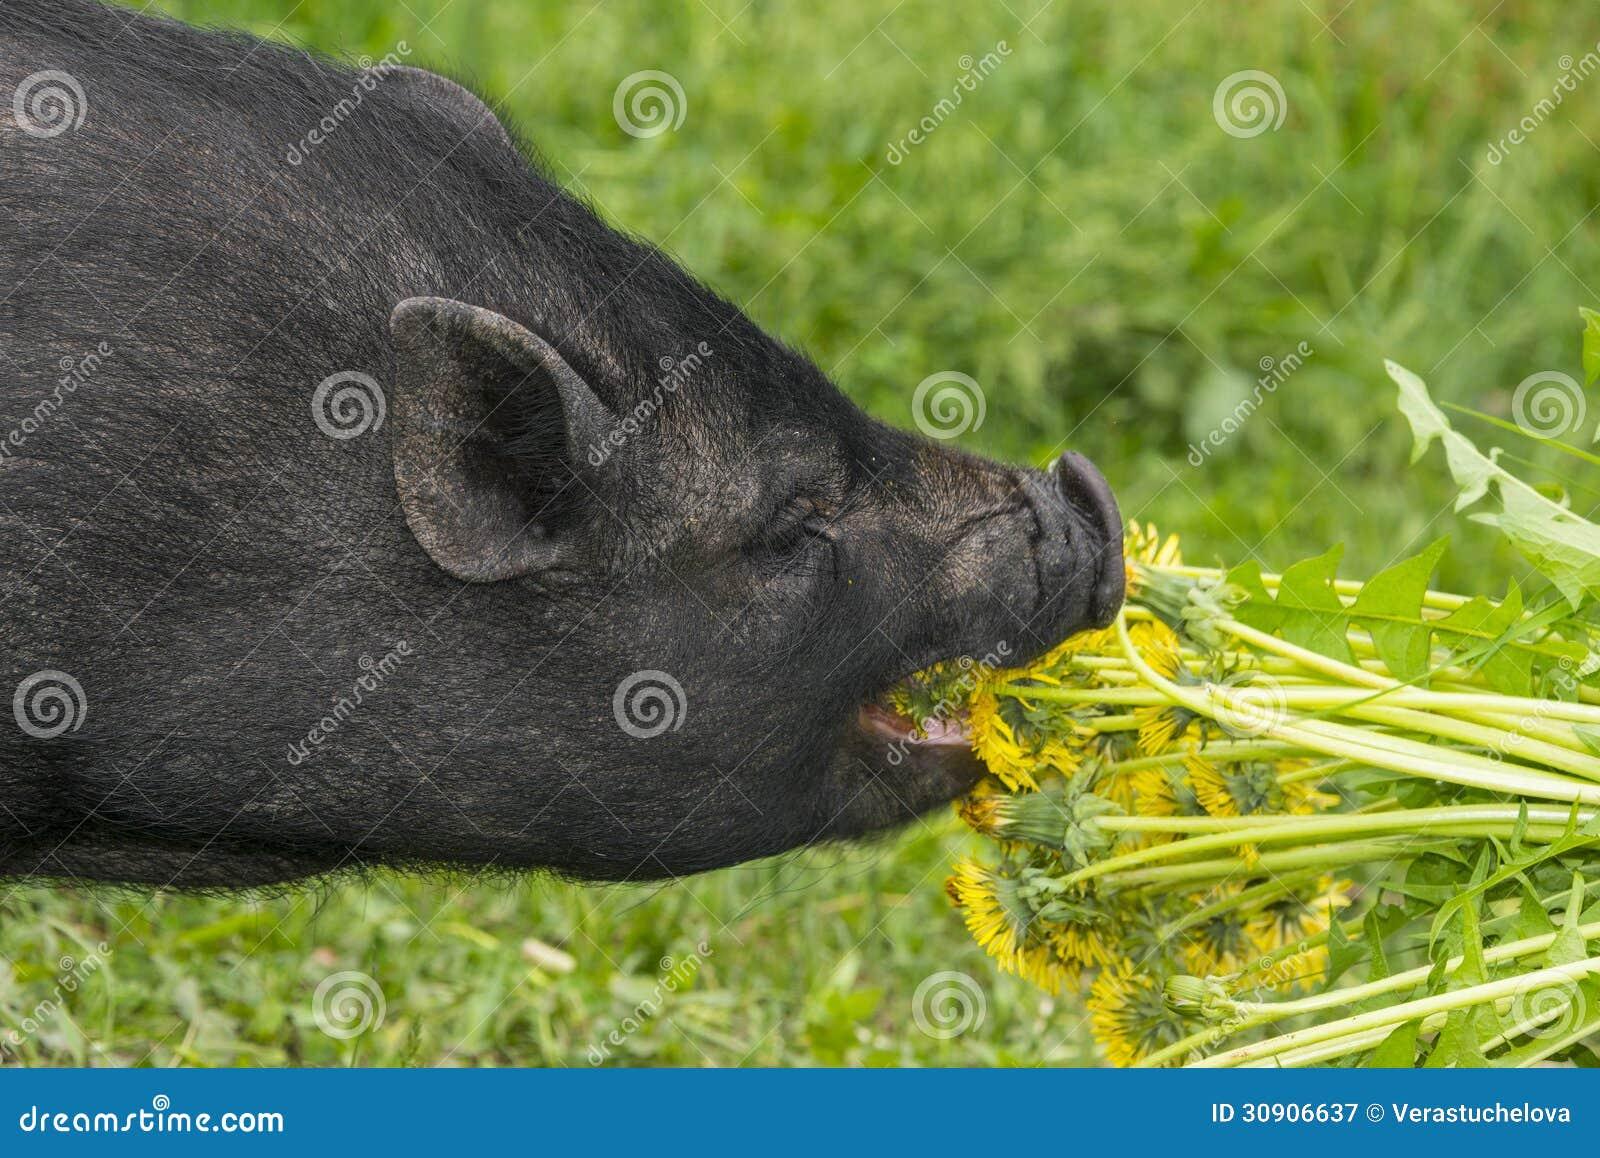 pig black holes - photo #4